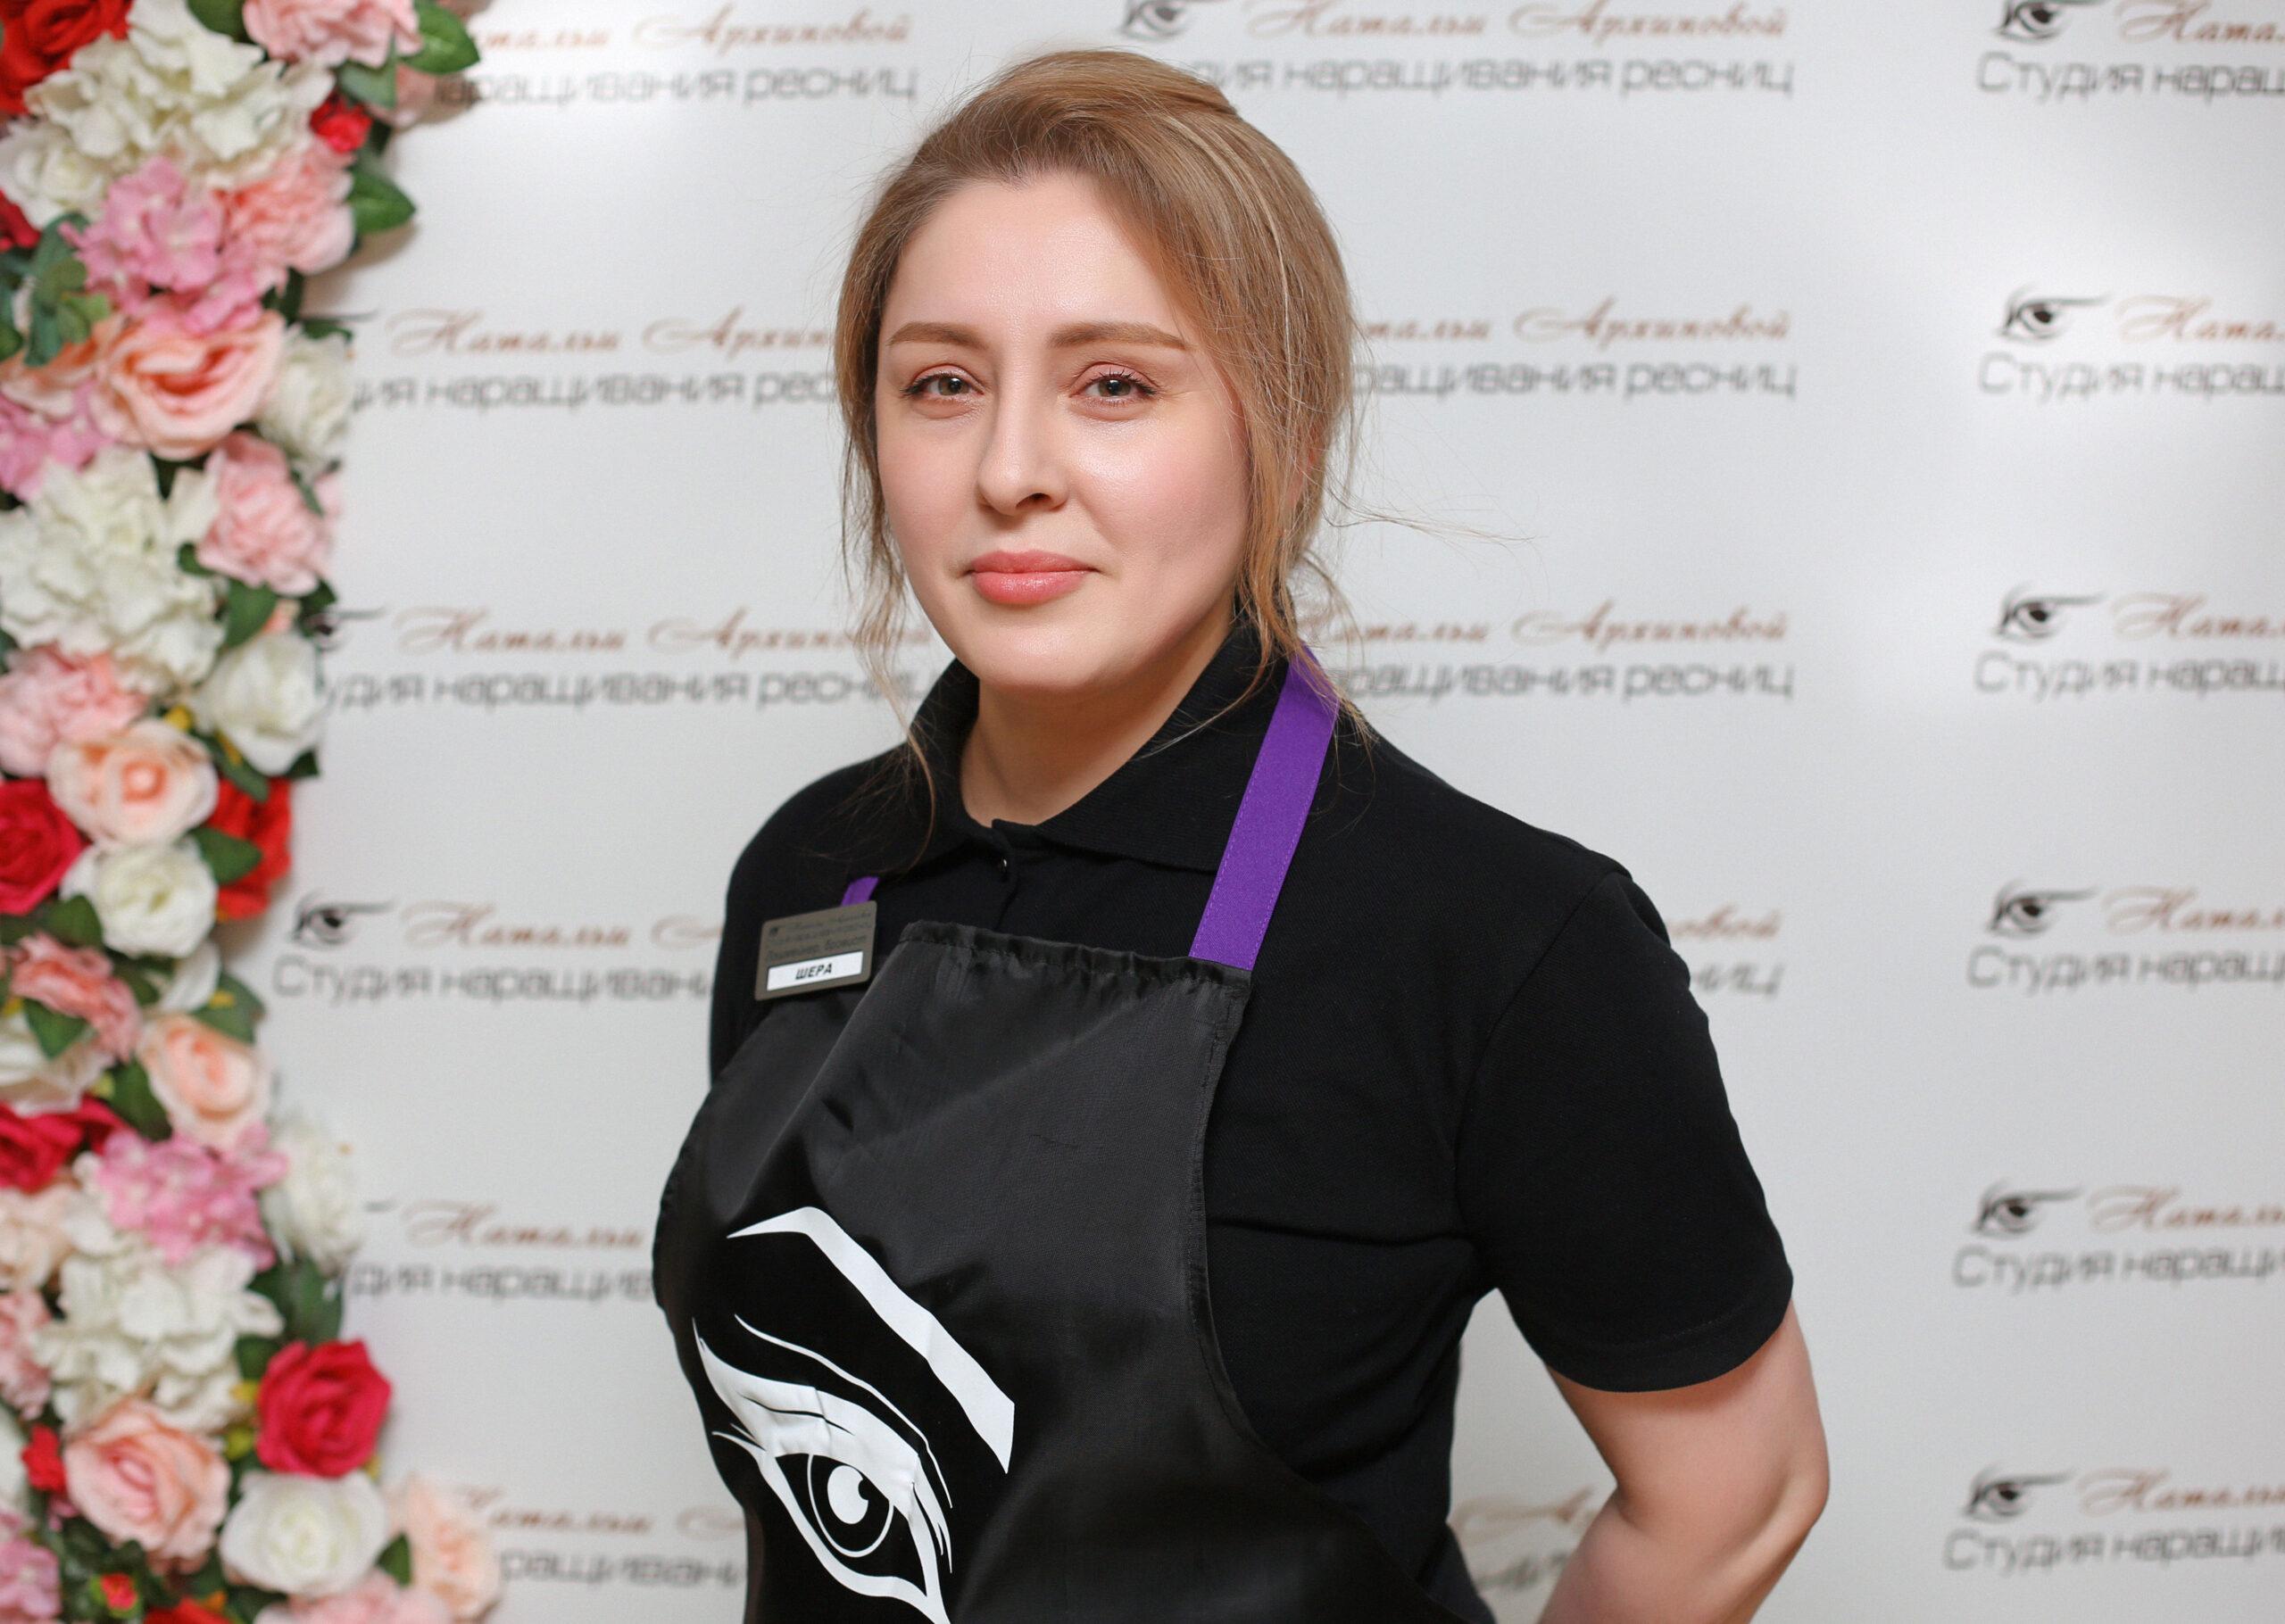 Шера Цискаришвили